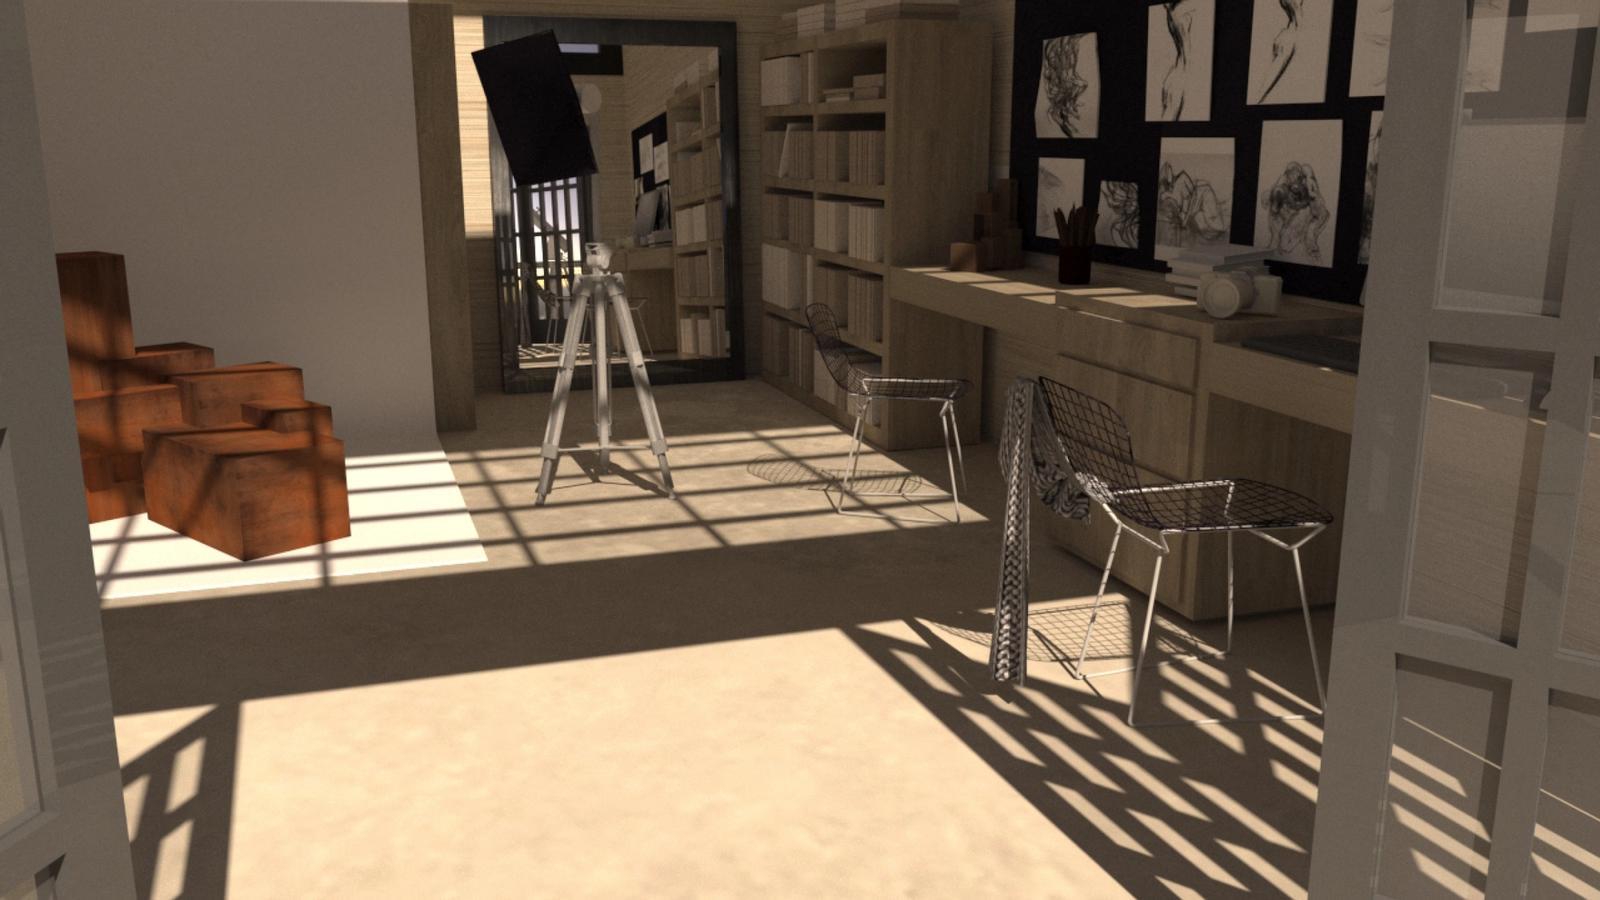 Artist Studio Loft - Studio at Noon